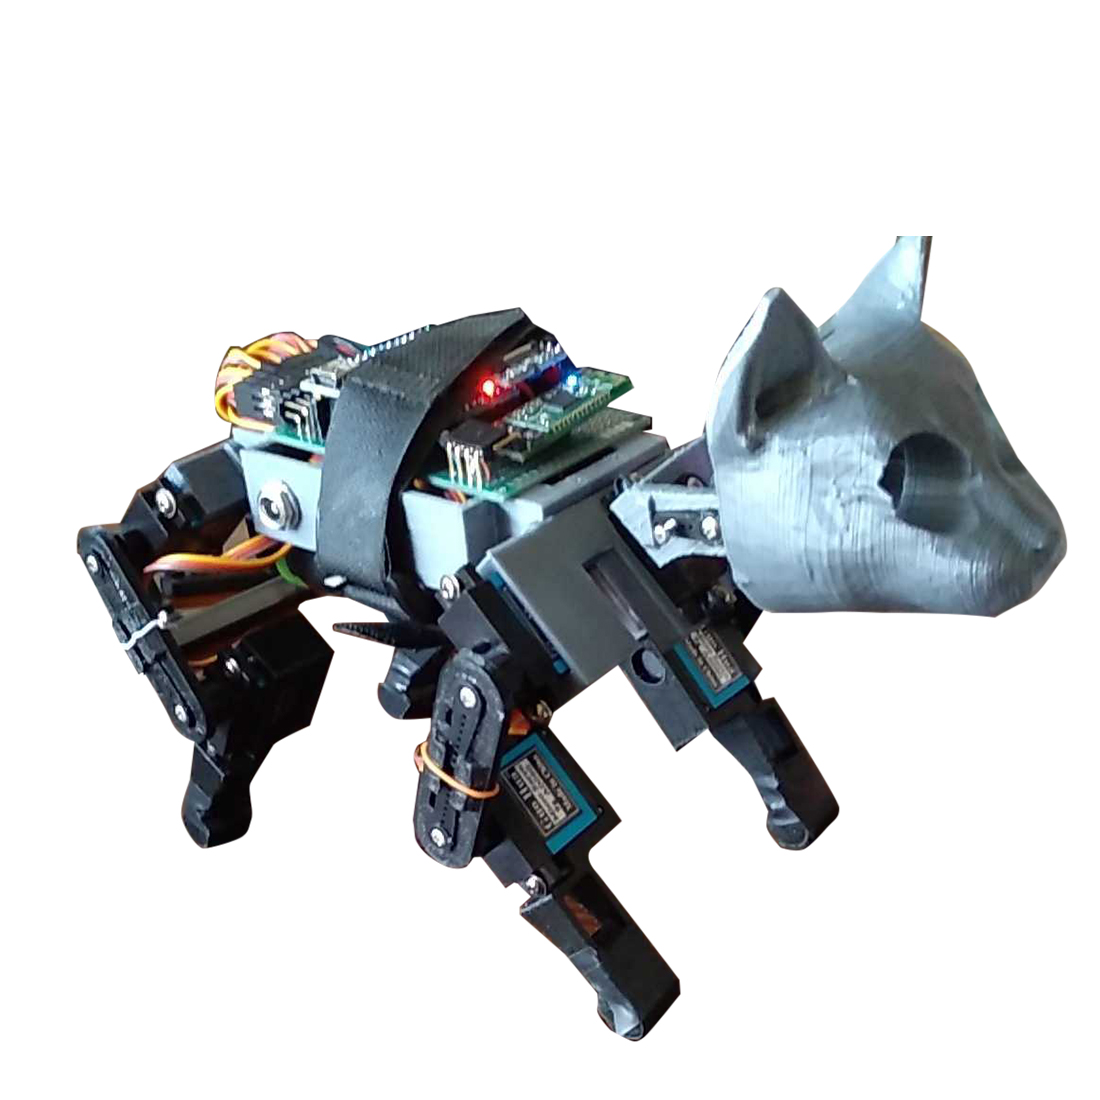 Programmable Mechanical Dog 11DOF Bionic Quadruped Crawling Robot Toy